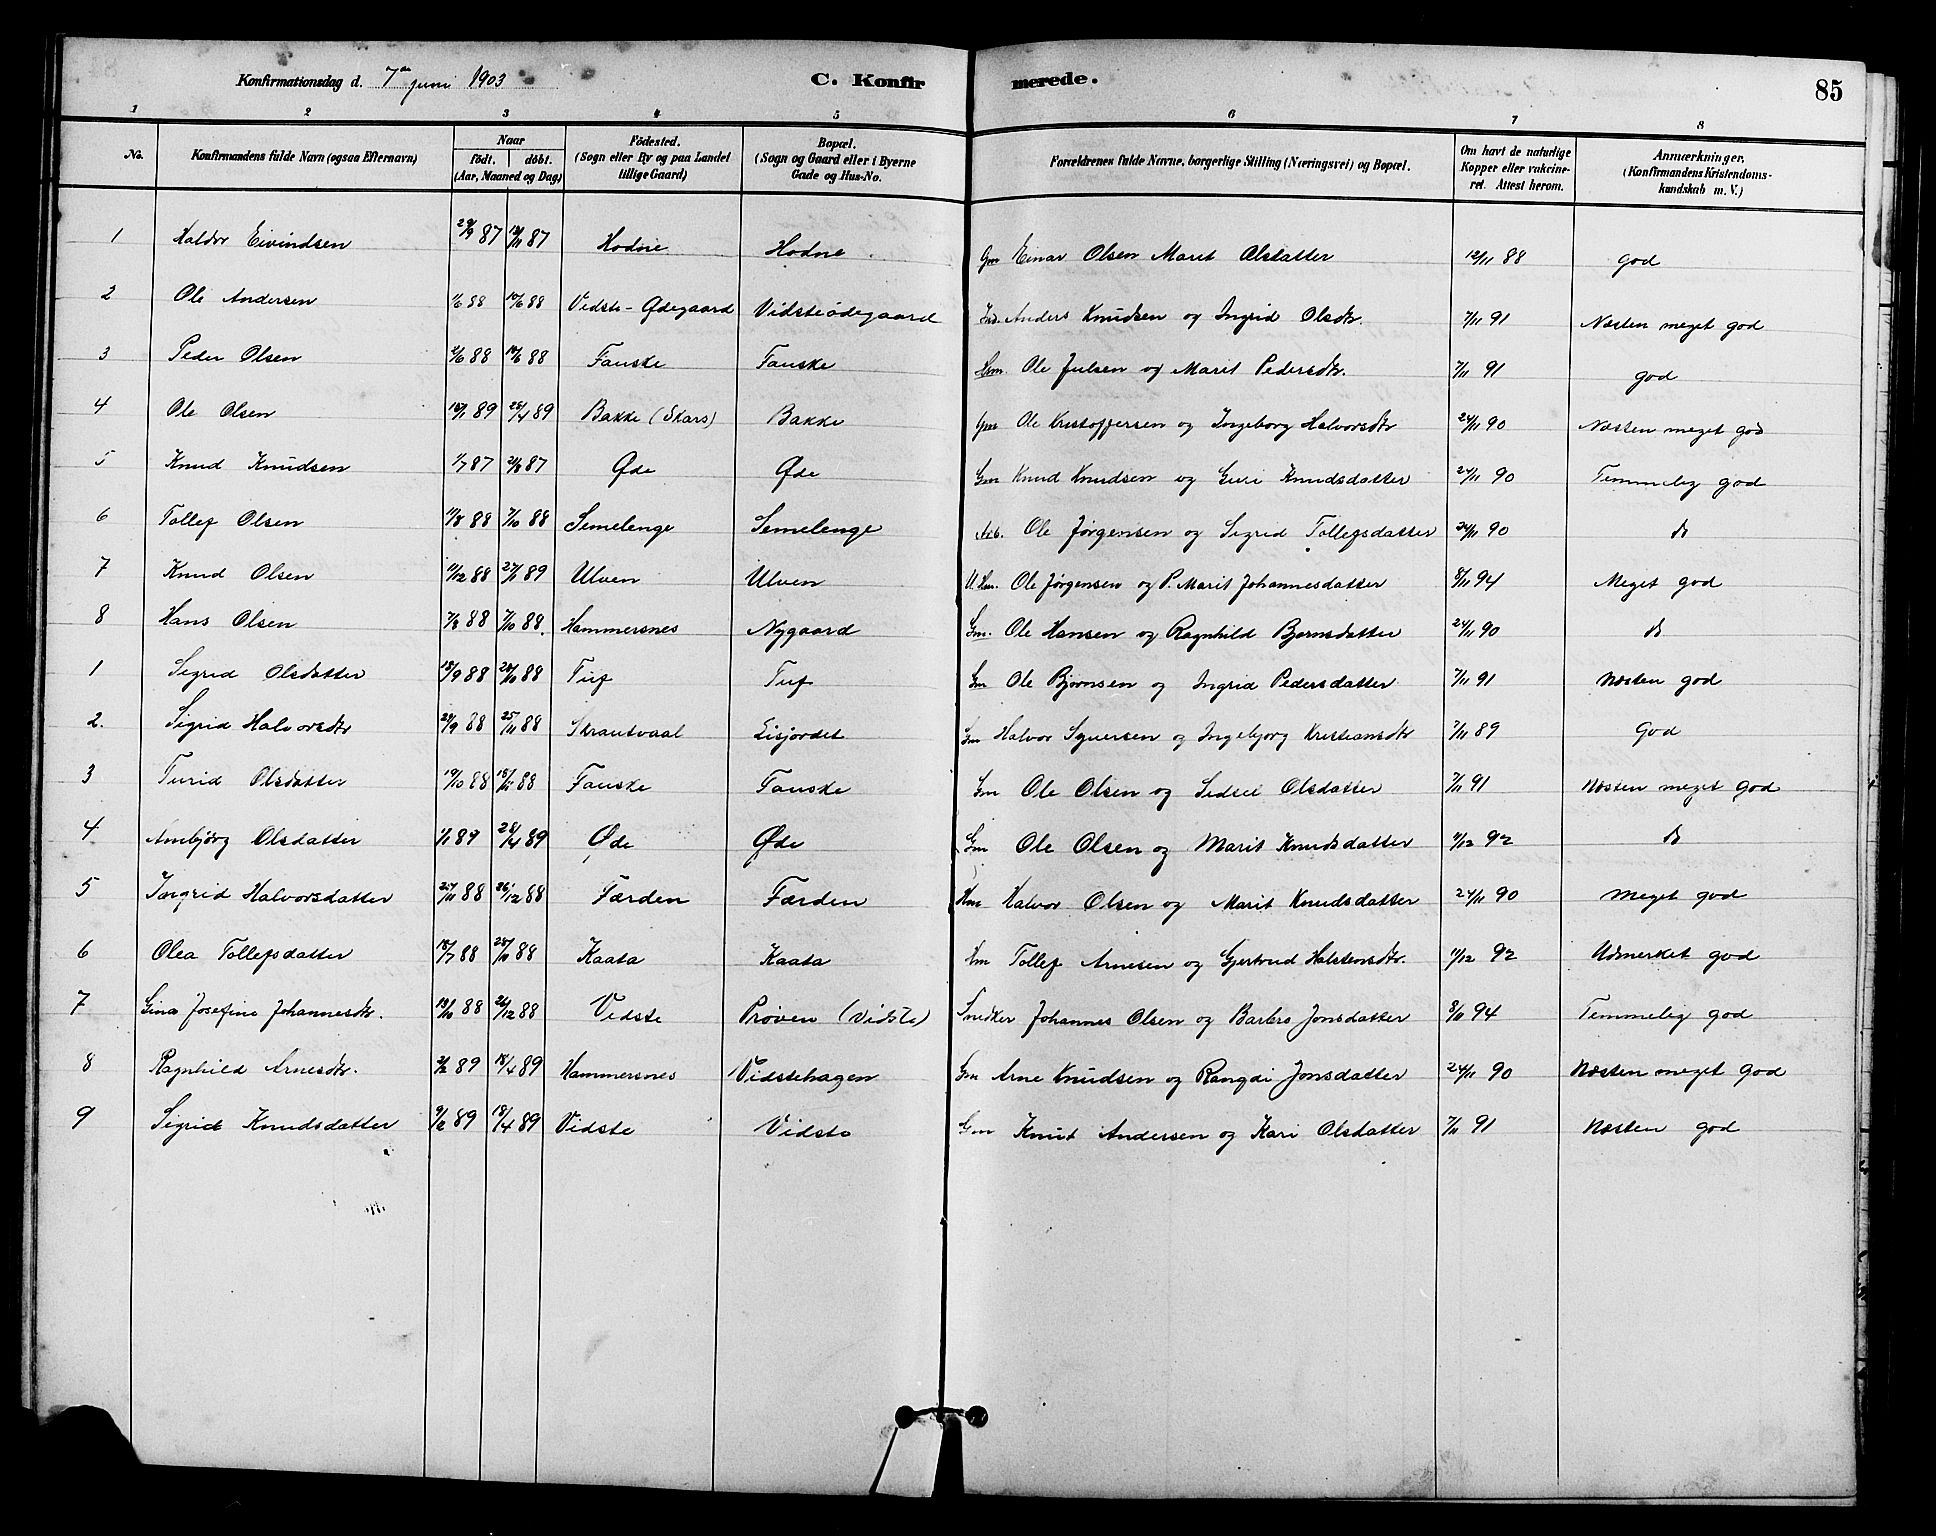 SAH, Vestre Slidre prestekontor, Klokkerbok nr. 5, 1881-1913, s. 85